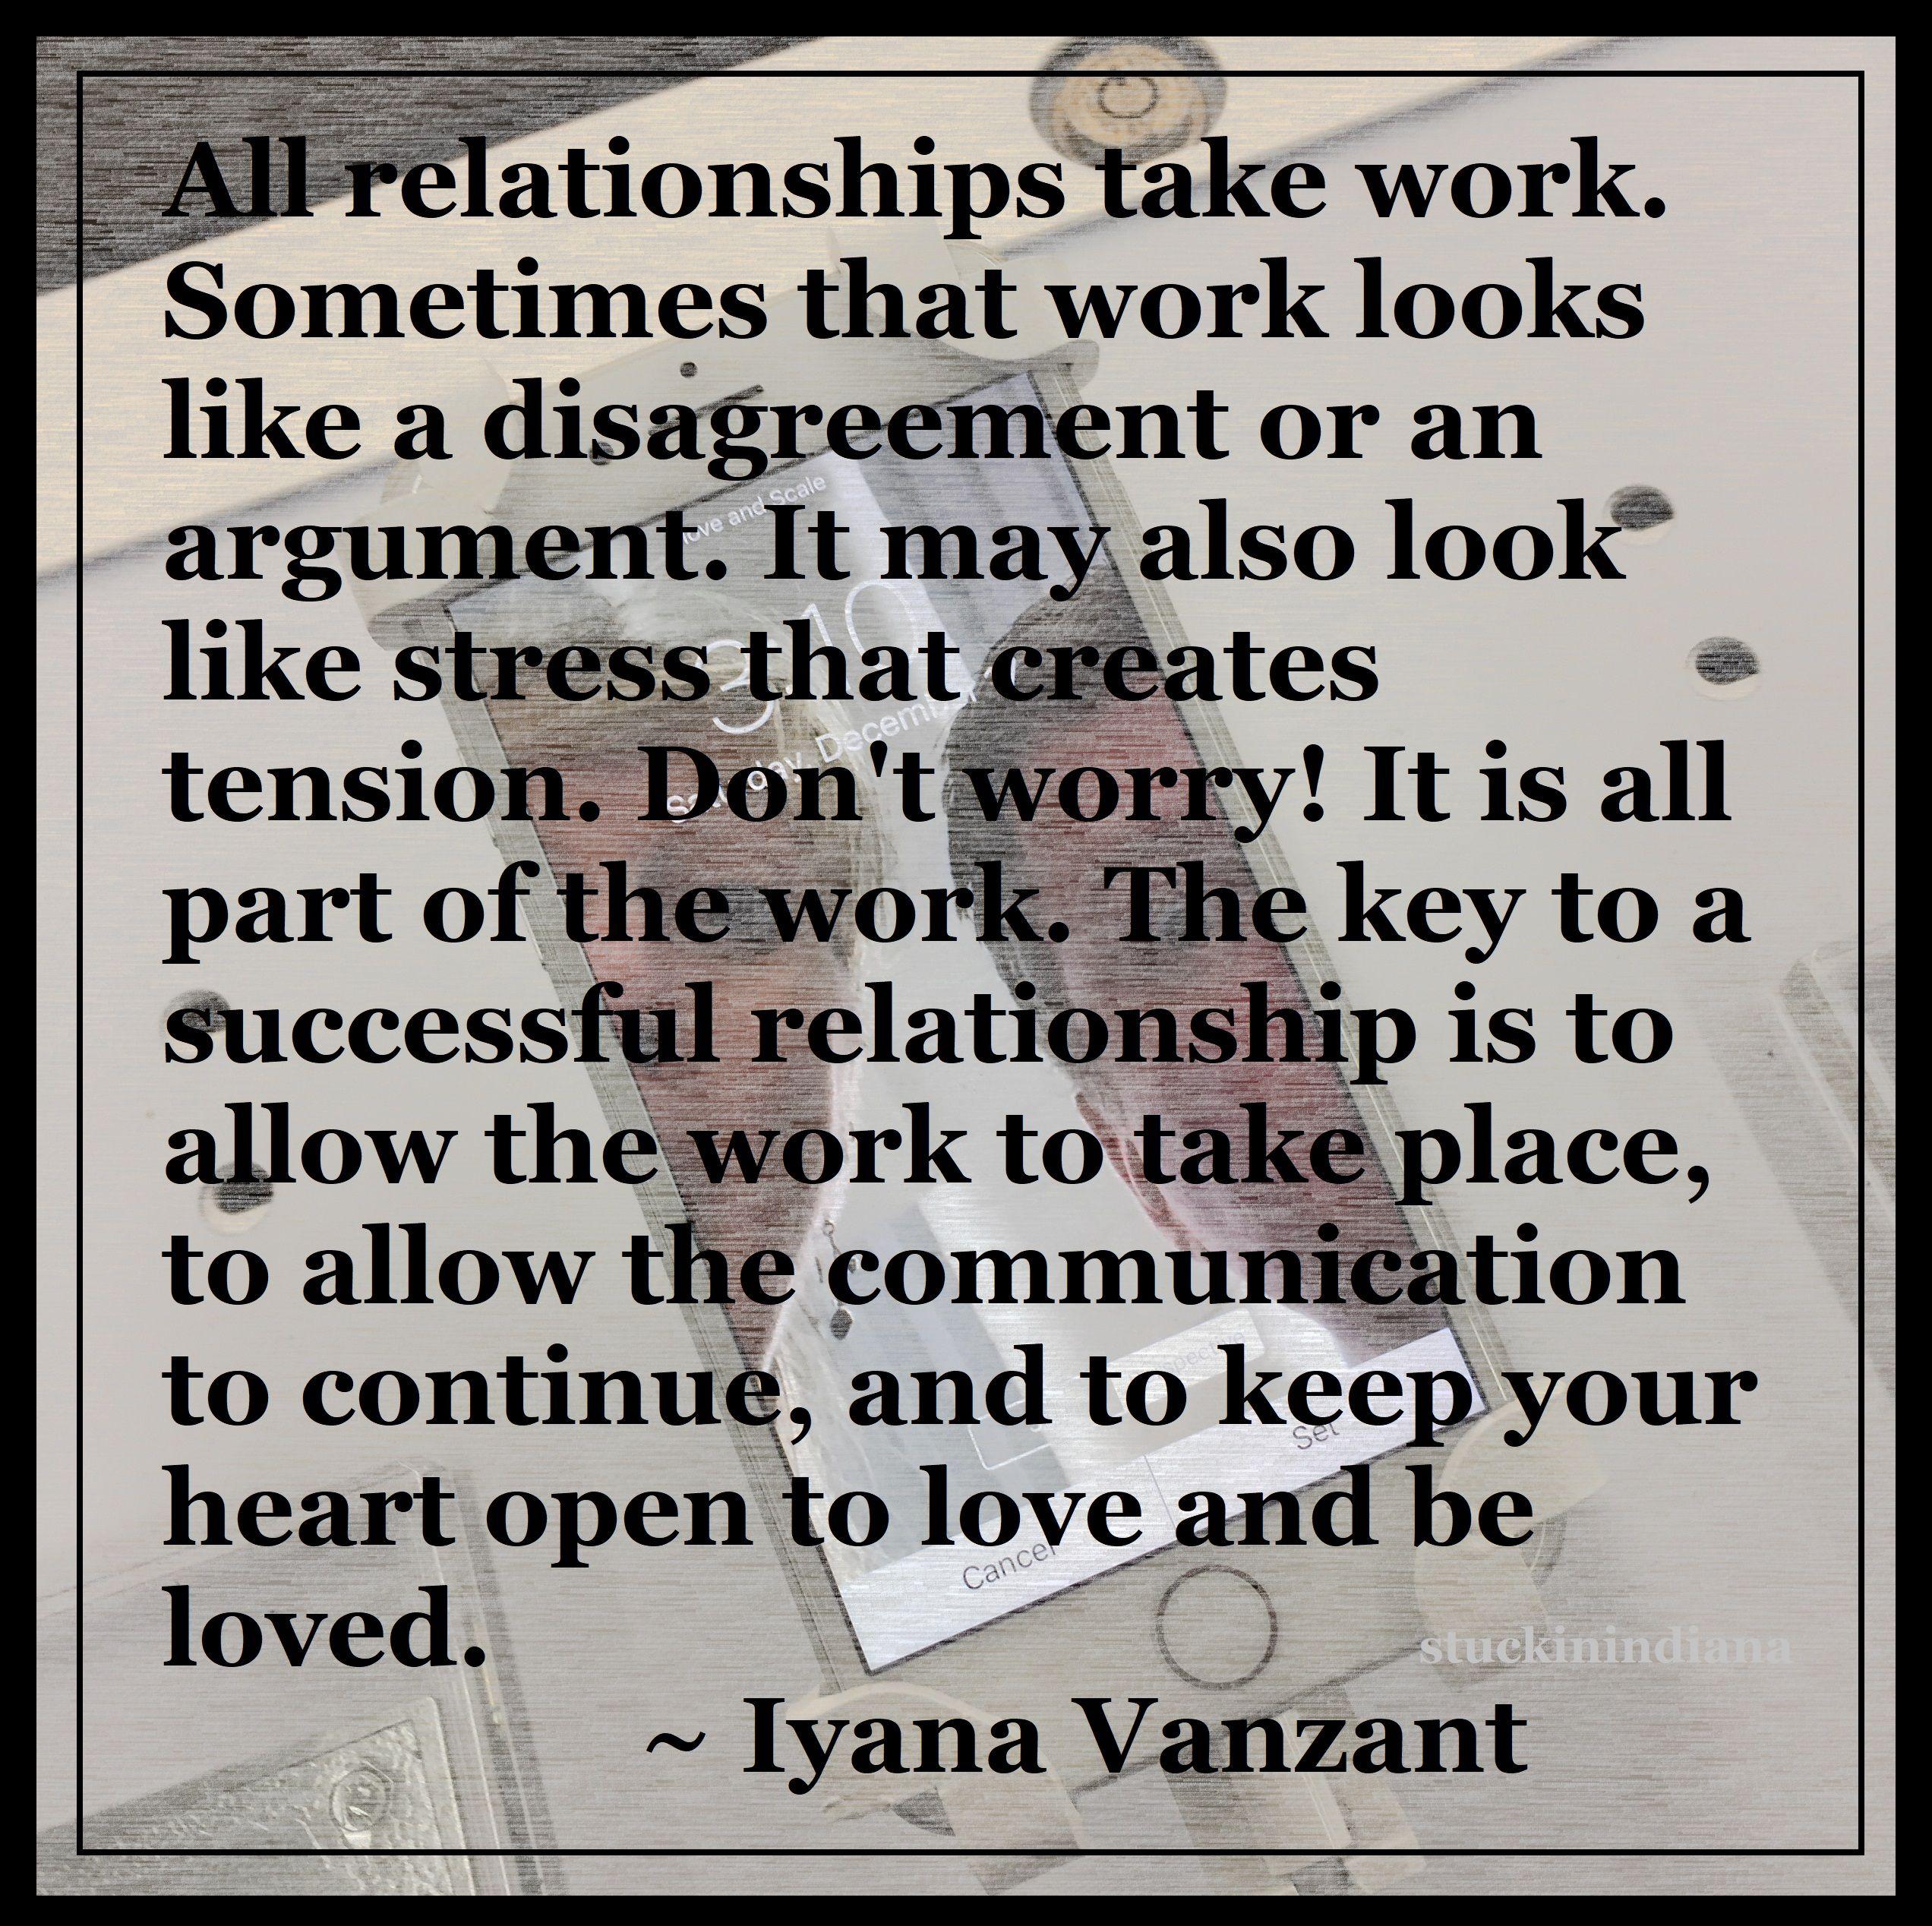 Do relationships take work